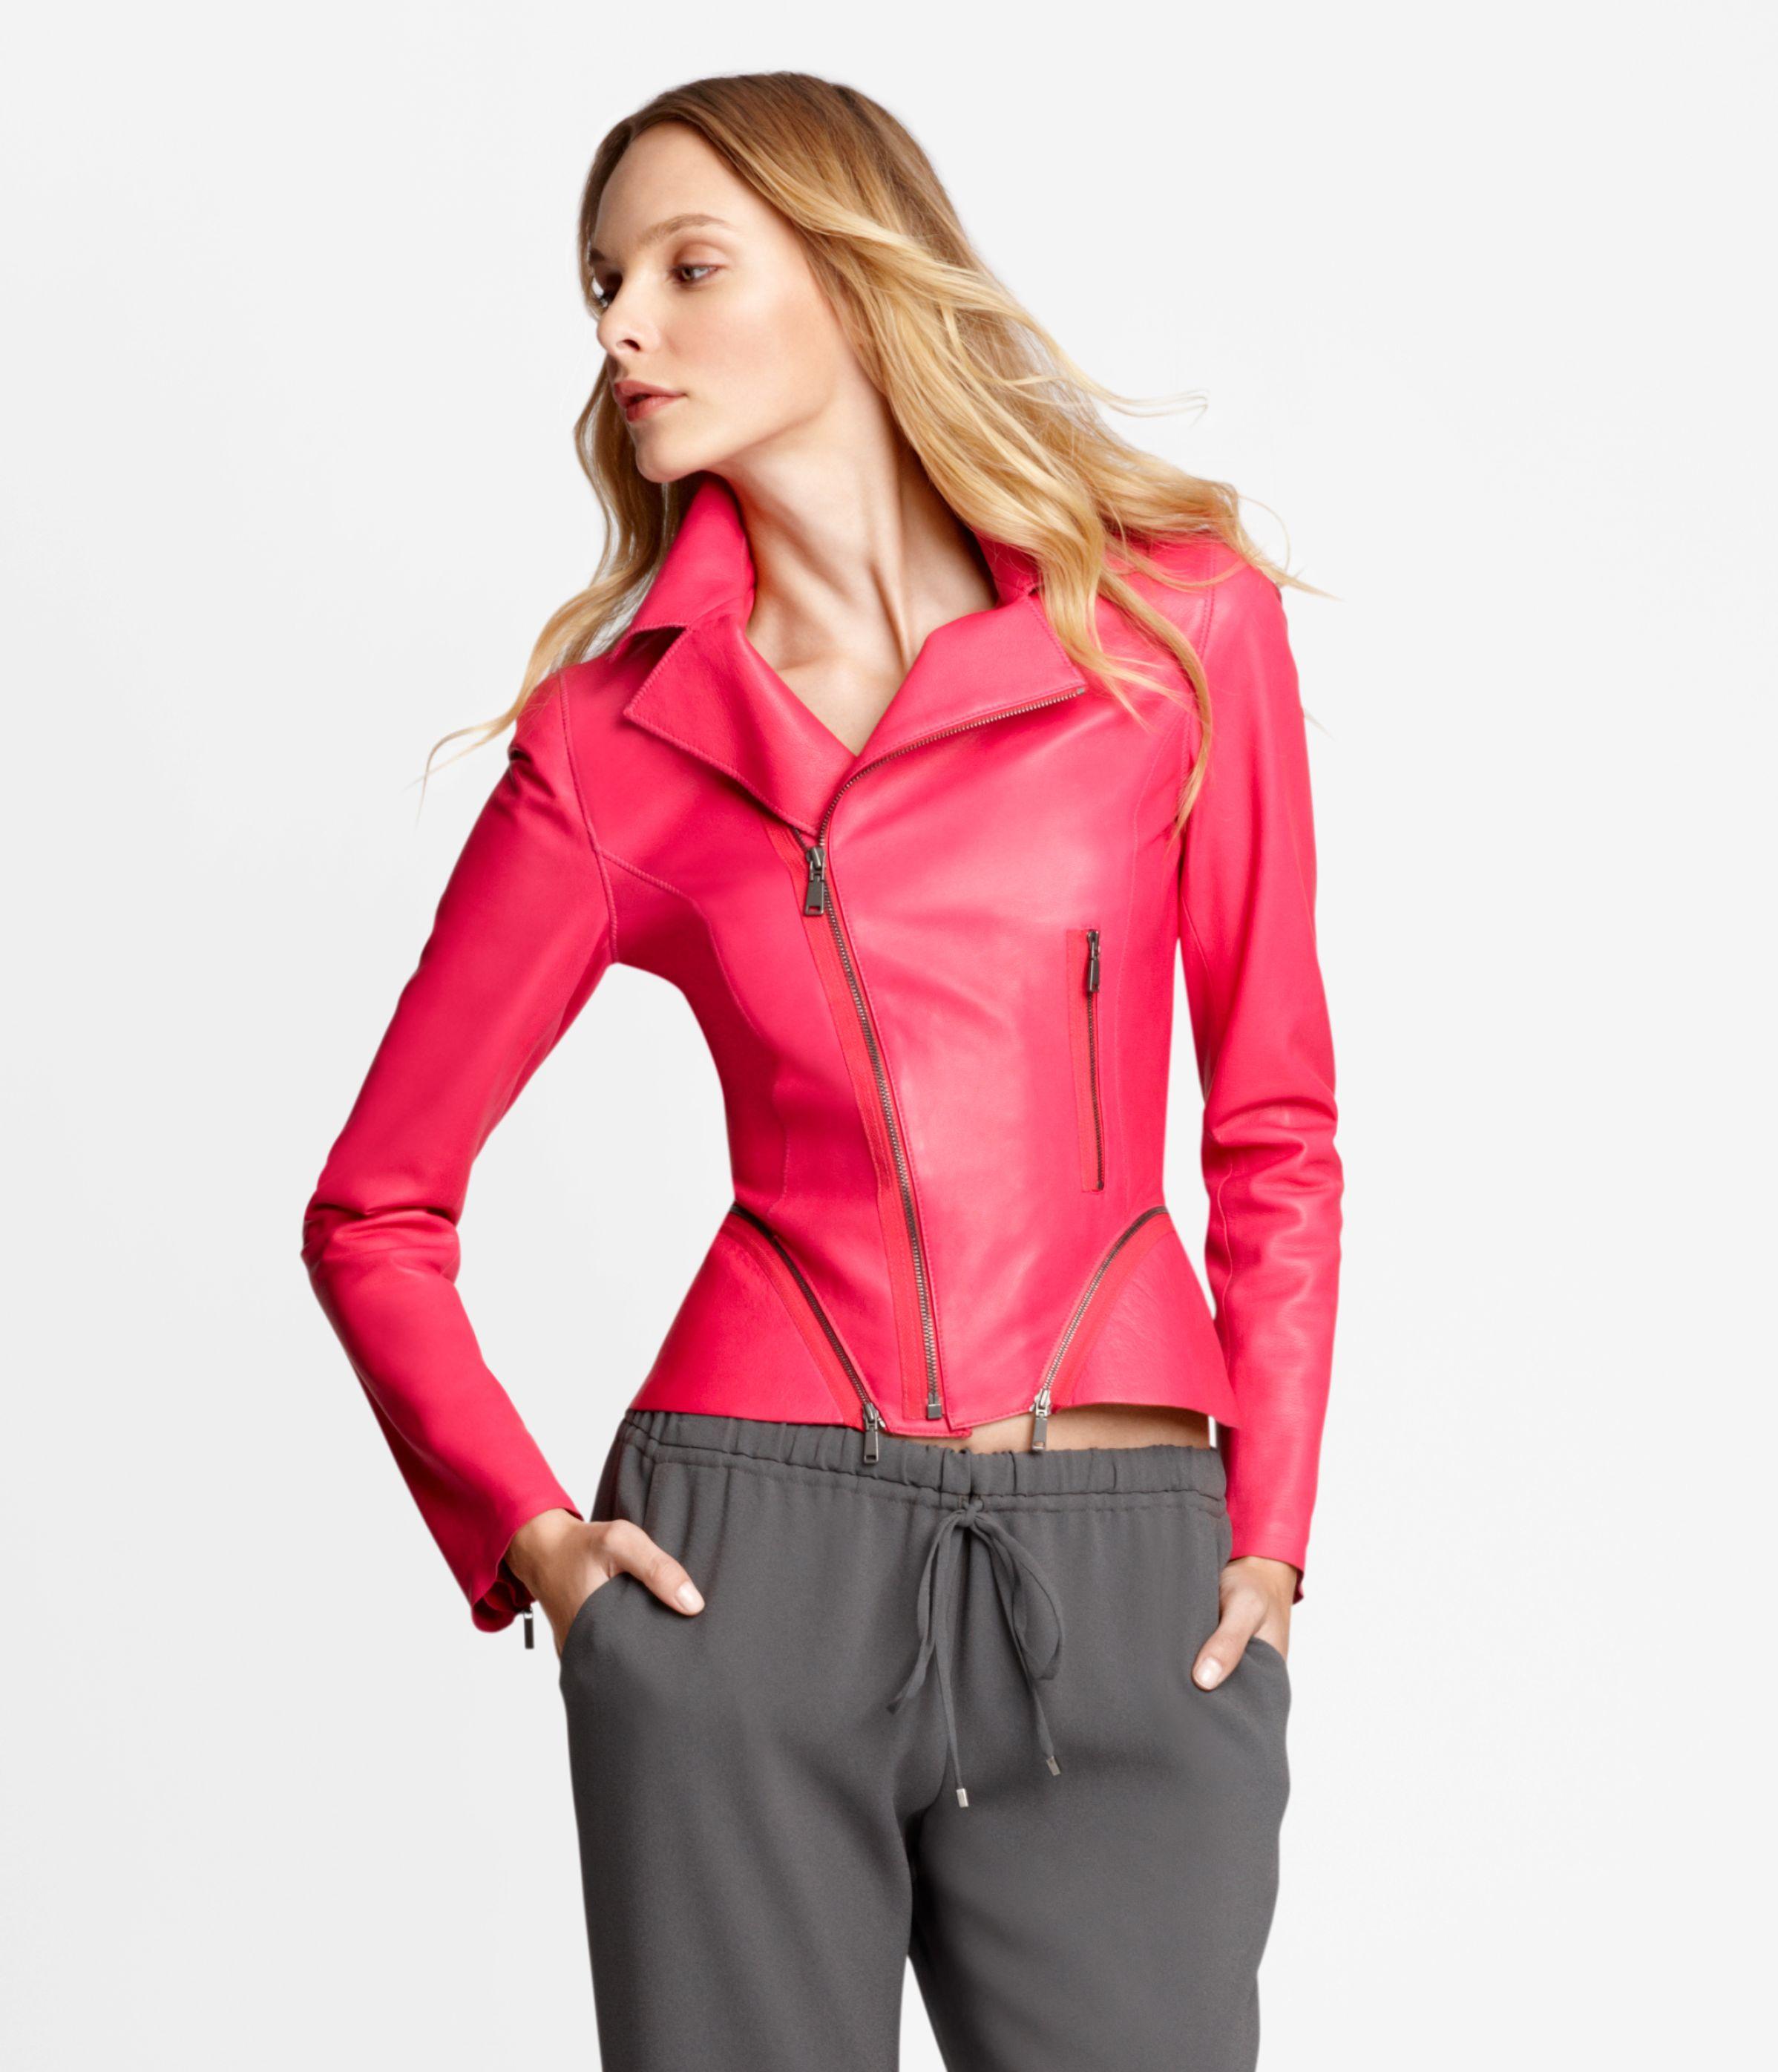 Emalia Jacket | Women's Jackets | Elie Tahari